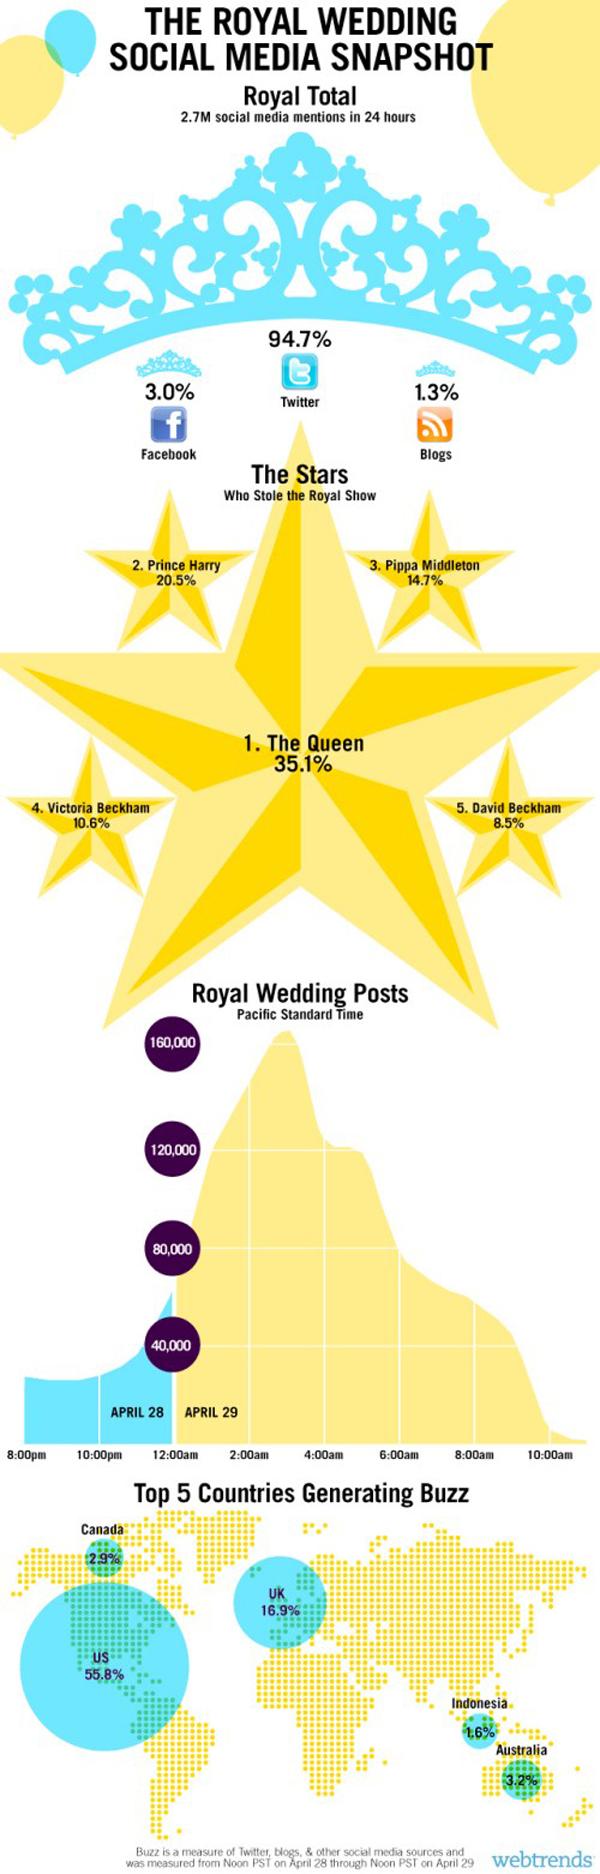 royal-wedding-infographic3.jpg